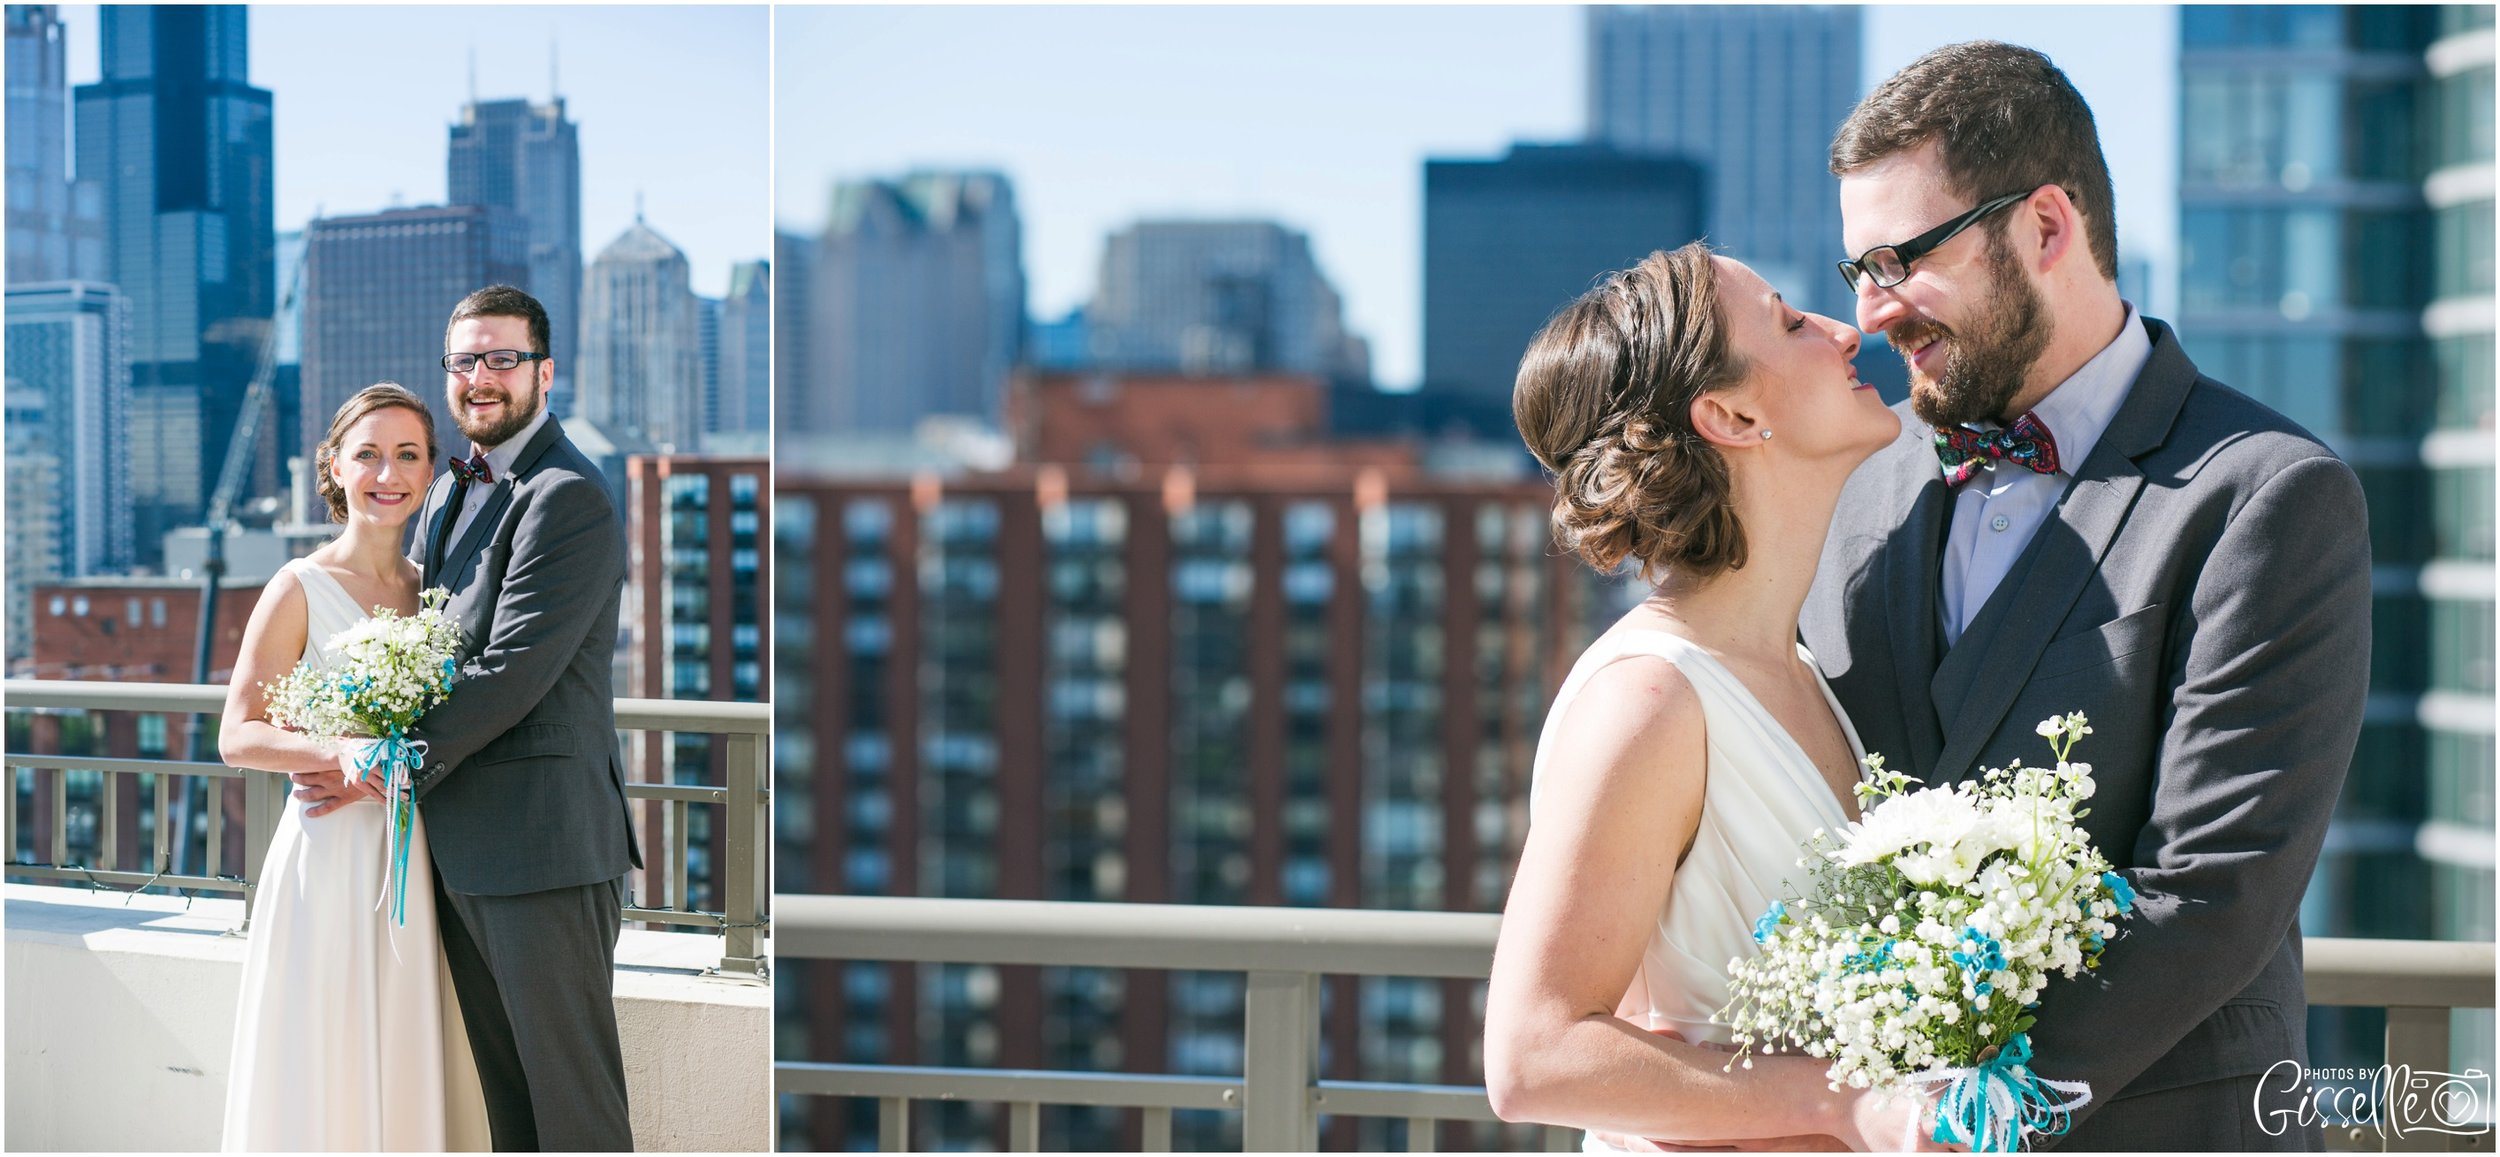 Chicago Rooftop Wedding_0070.jpg